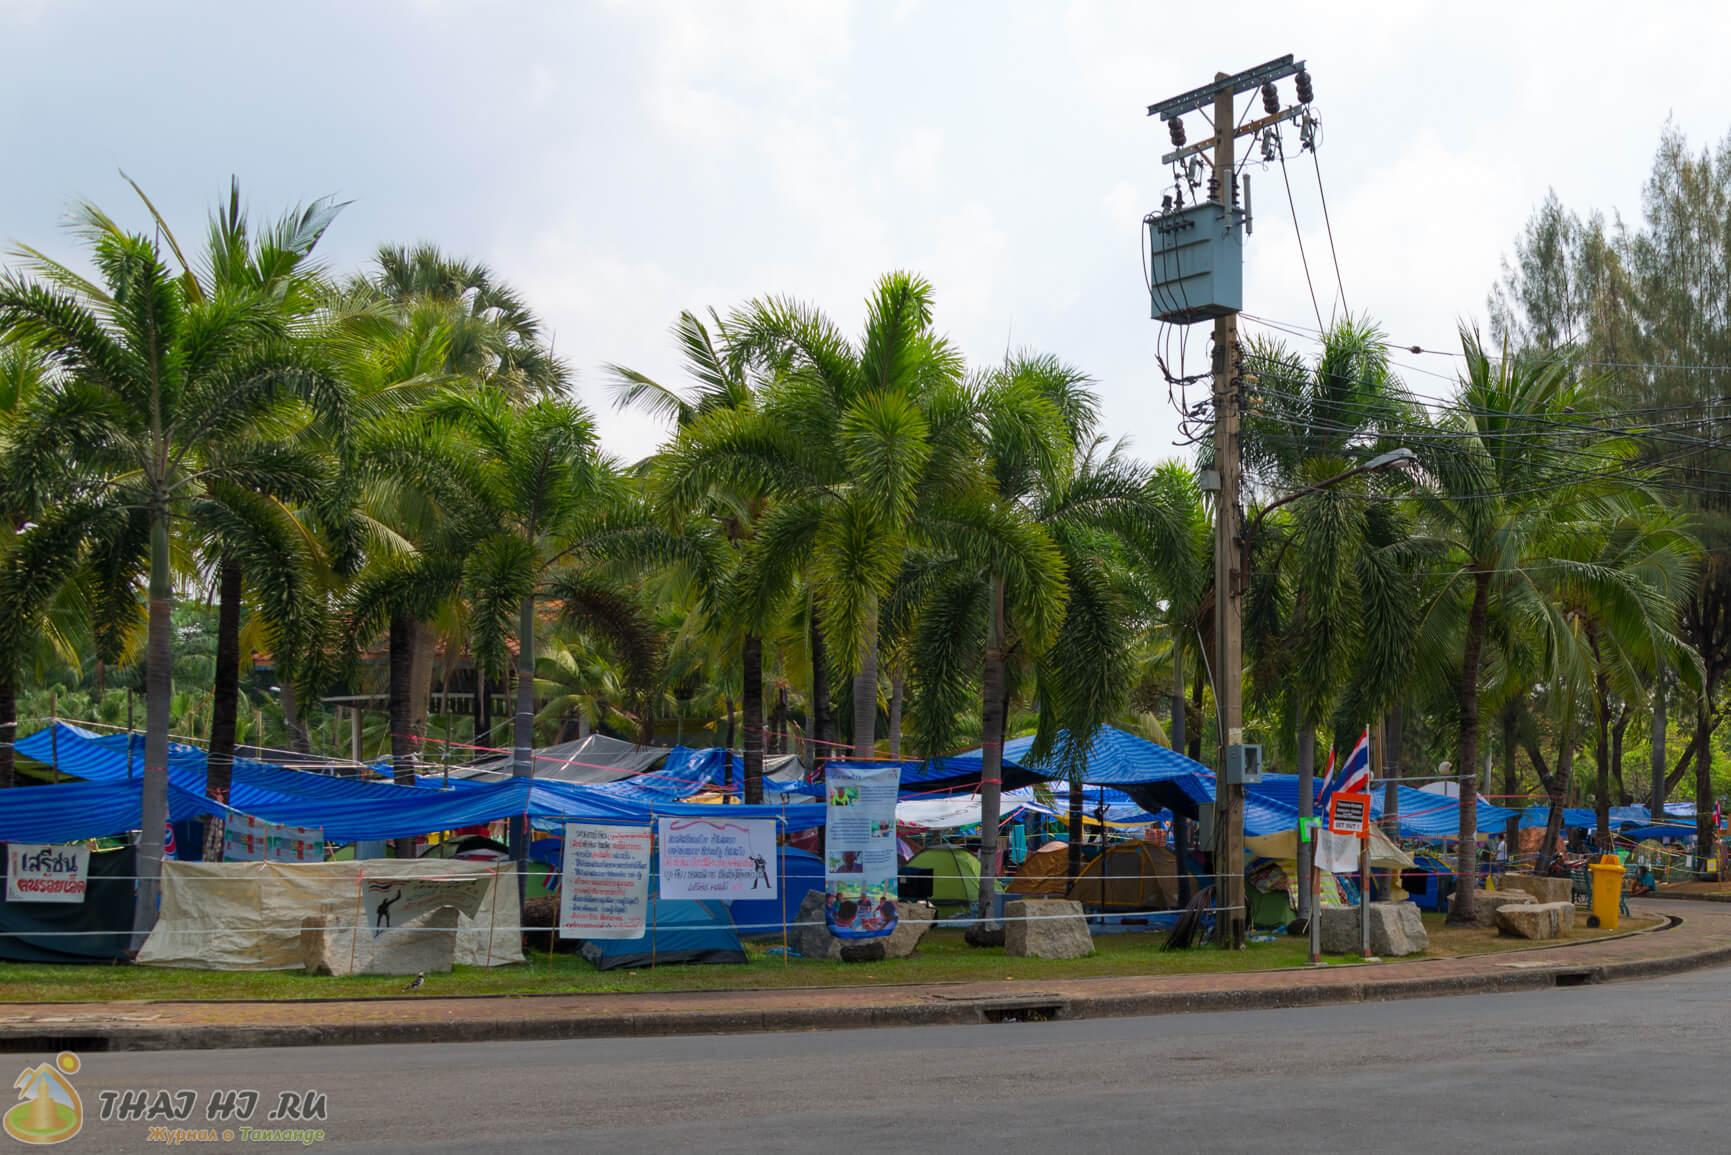 Фото в парке Люмпини в Бангкоке